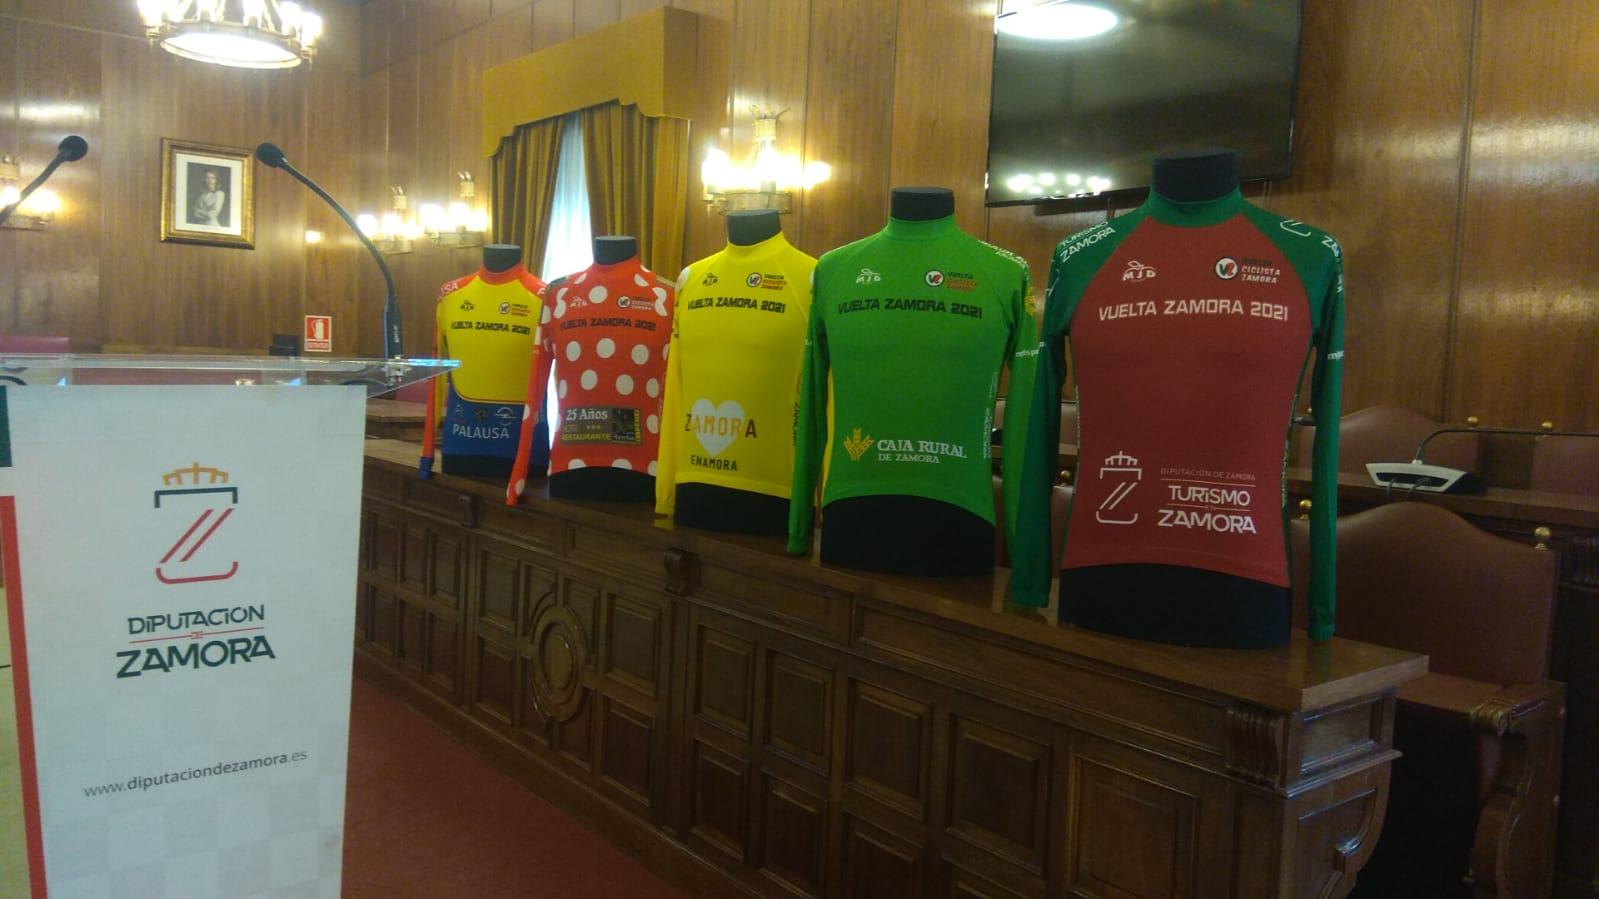 Maillots de las diferentes clasificaciones de la Vuelta a Zamora 2021